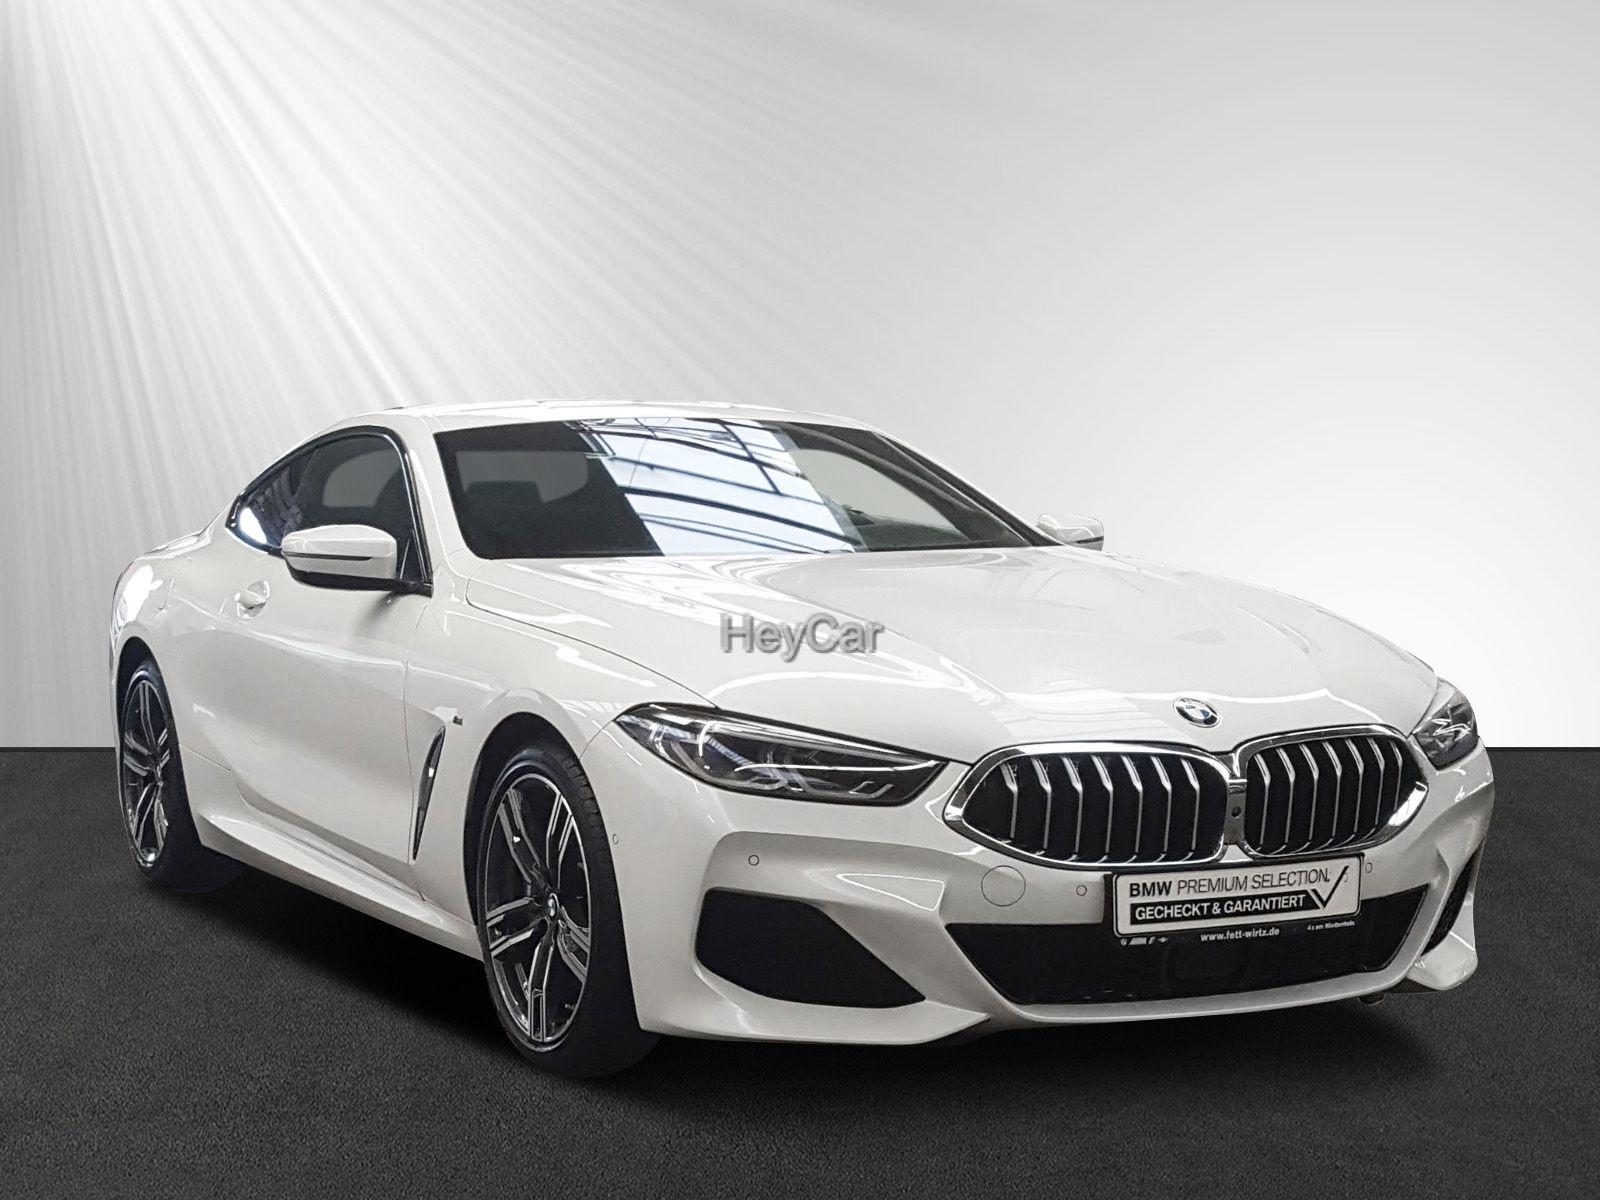 BMW 840d xDrive Coupe M-Sport Leas. ab 799,- br.o.Az, Jahr 2019, Diesel